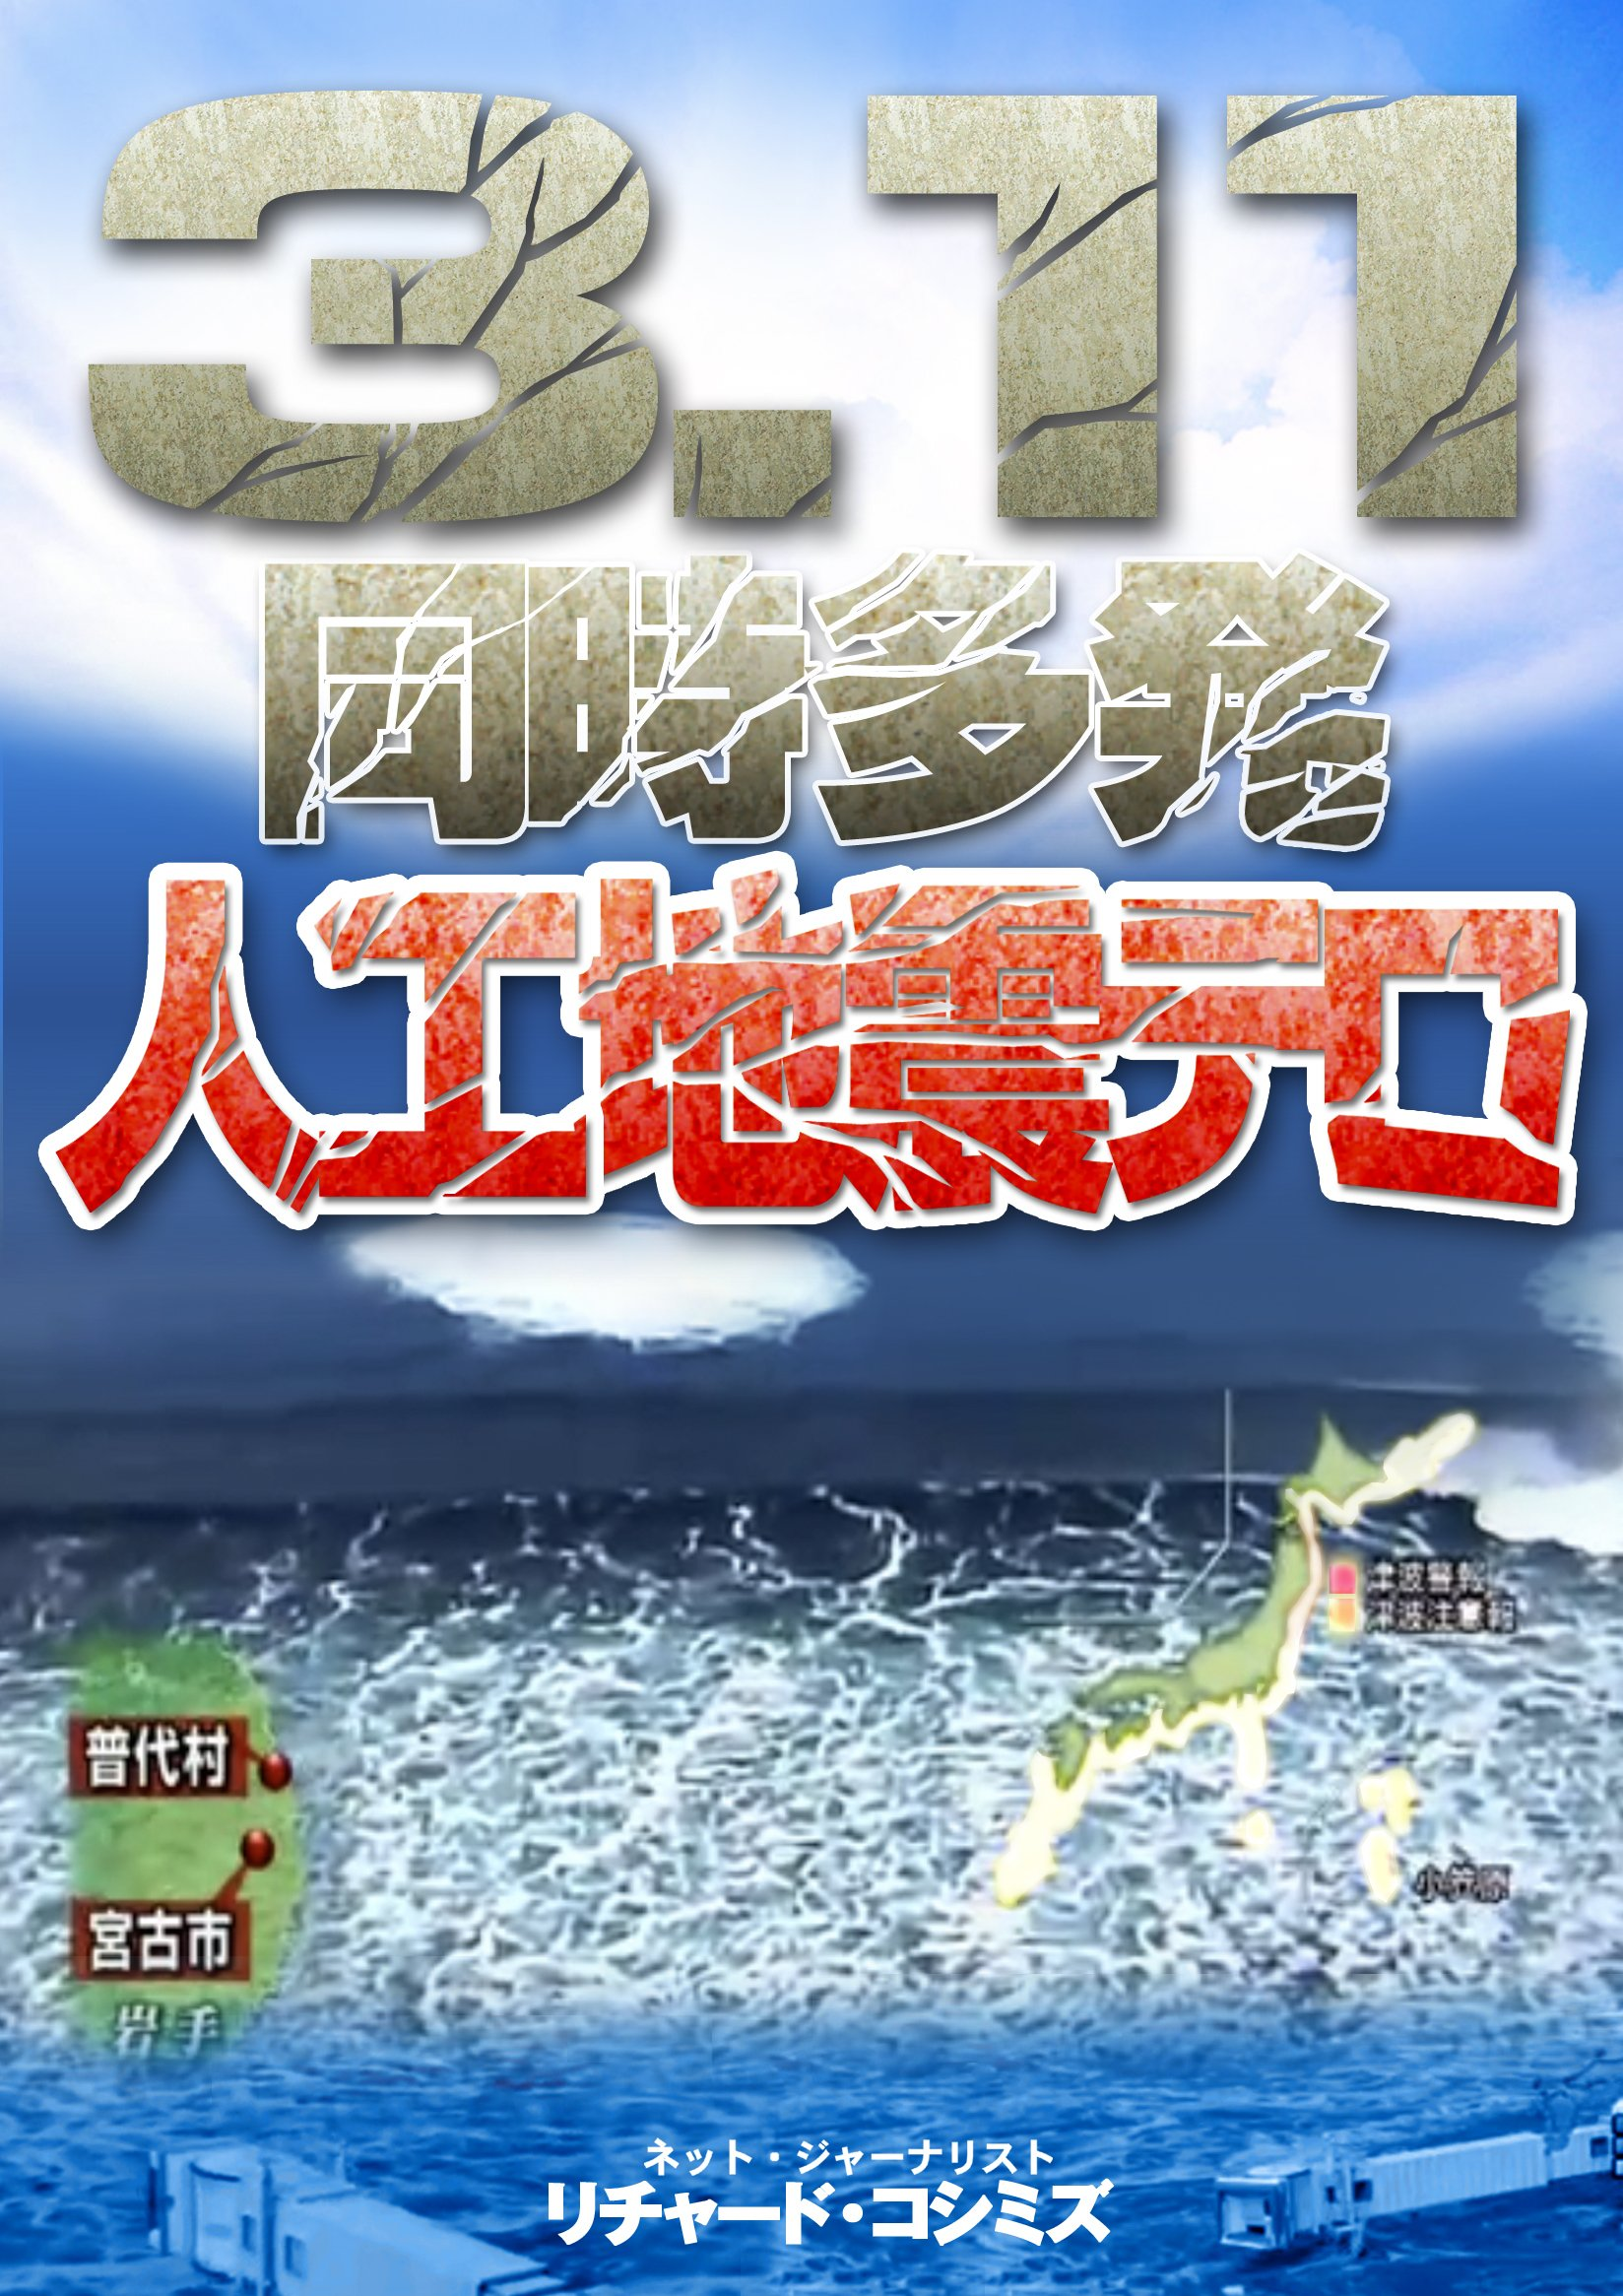 Amazon.co.jp: 3.11同時多発人工地震テロ: リチャード・コシミズ ...